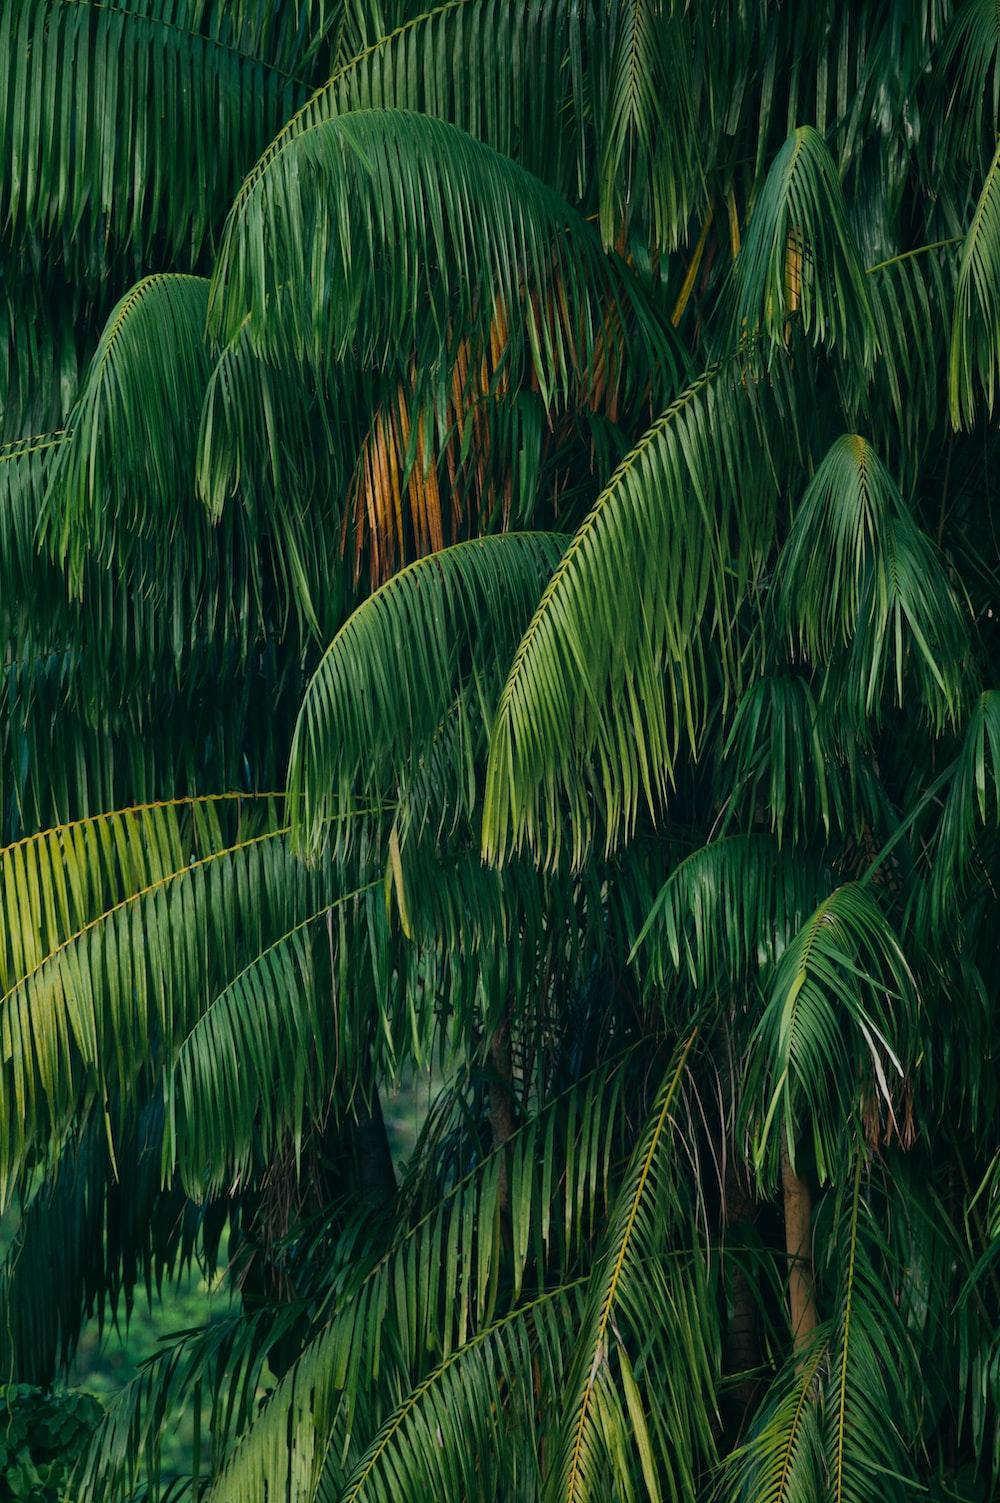 green coconut tree